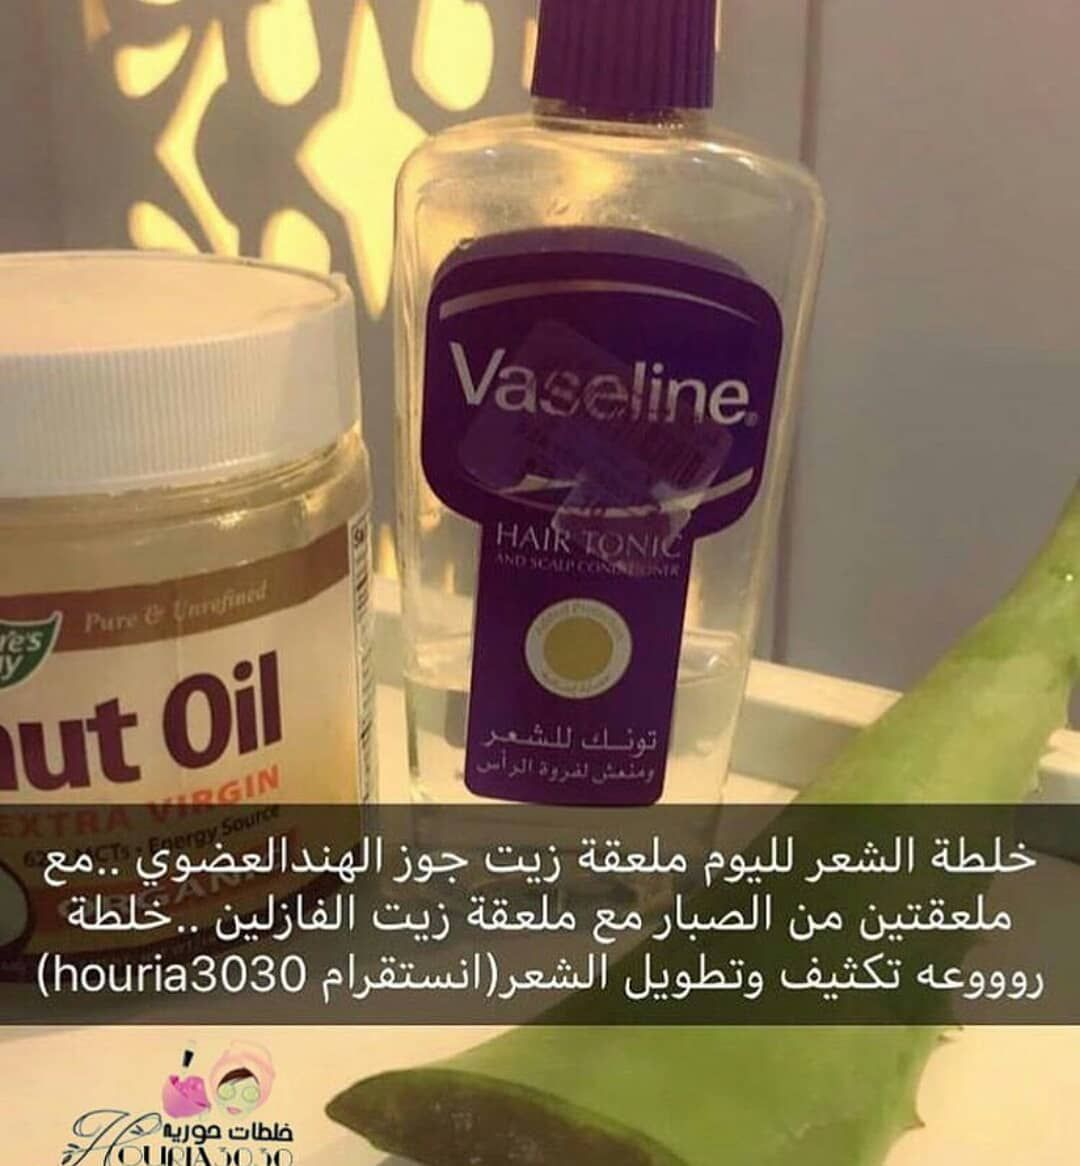 Image May Contain Text Hand Soap Bottle Soap Bottle Vaseline